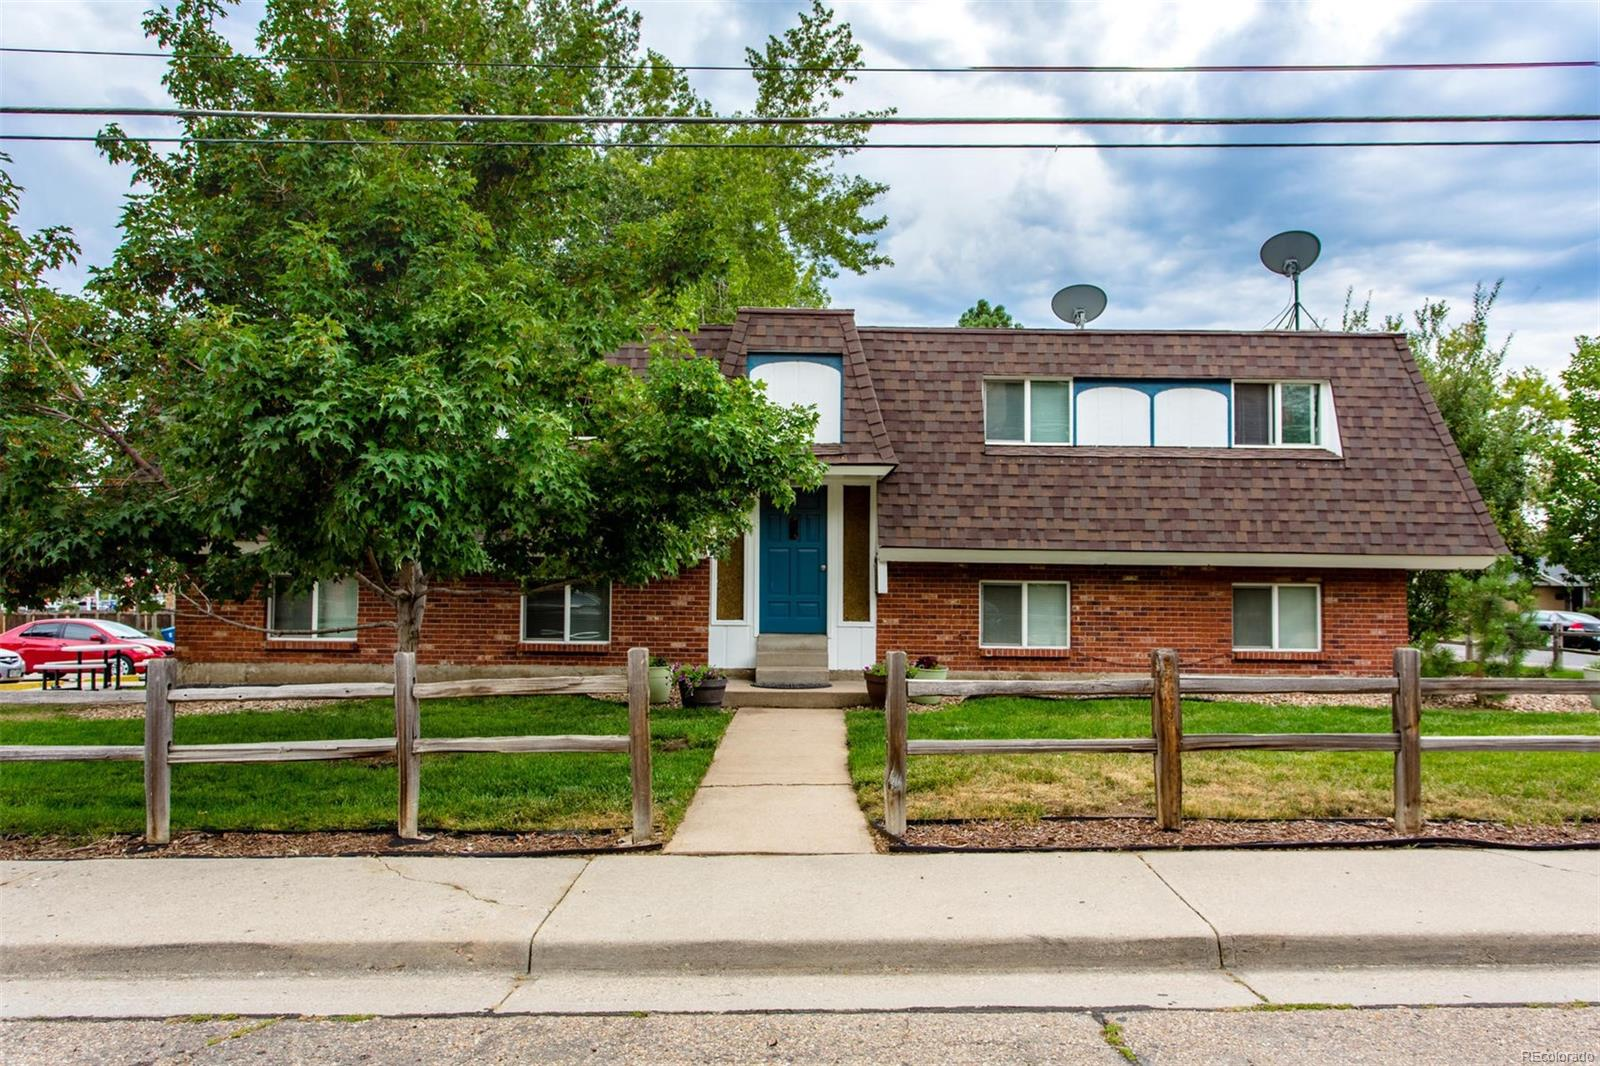 7660 W 65th Avenue, Arvada, CO 80004 - Arvada, CO real estate listing